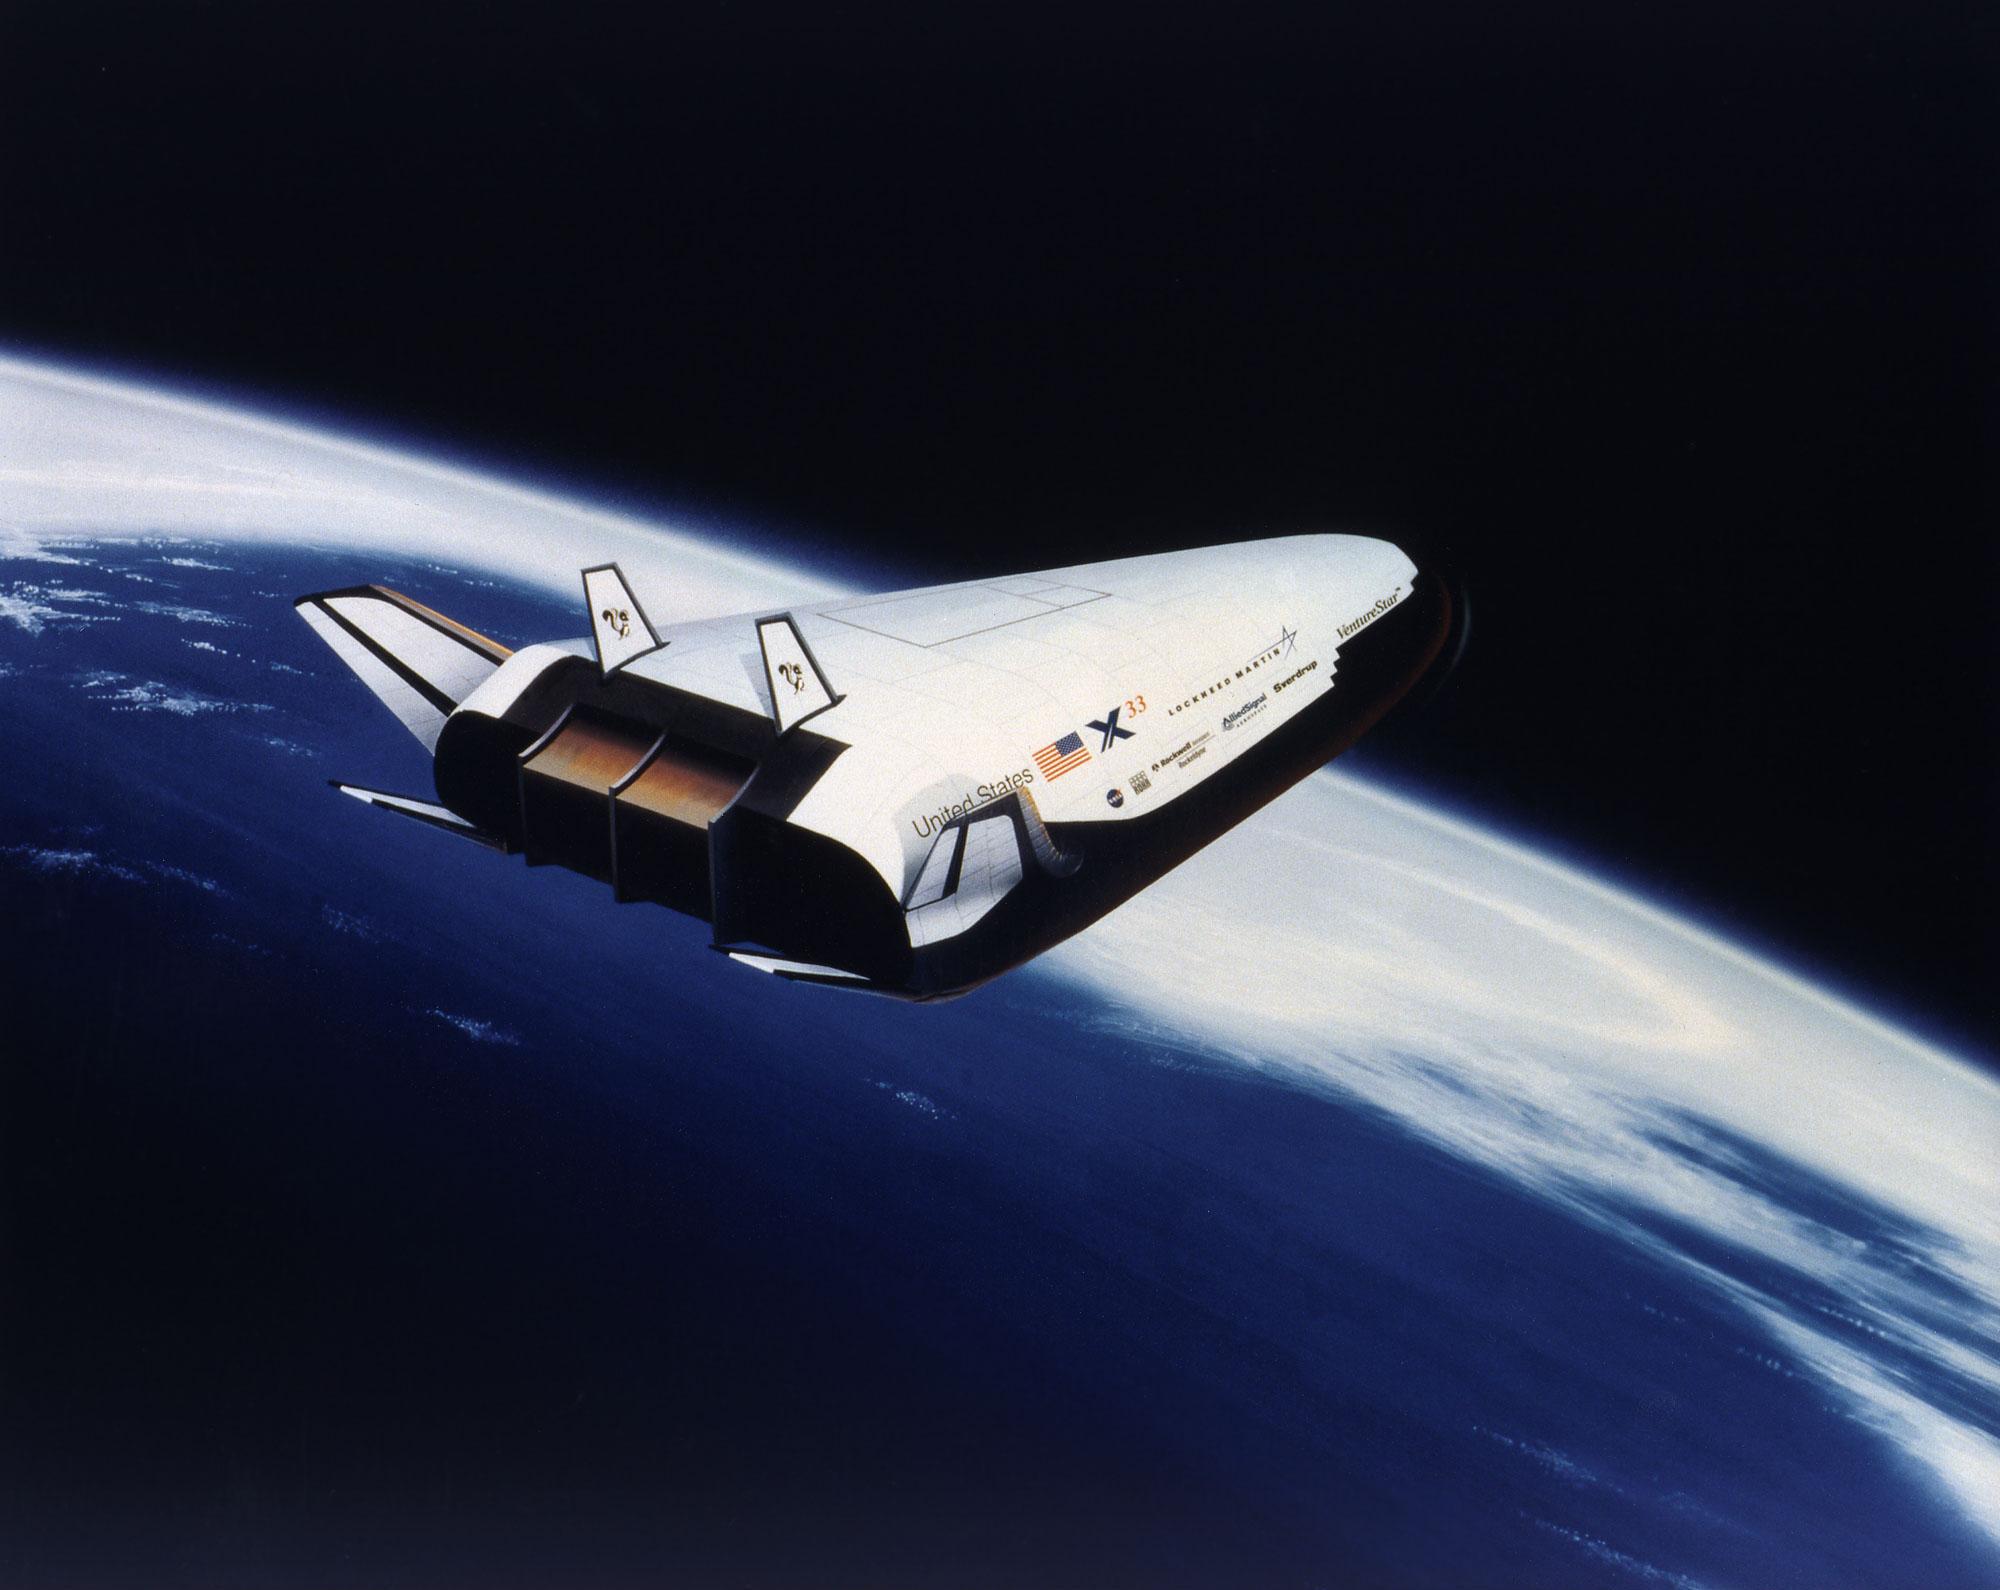 lockheed martin space shuttle - photo #35